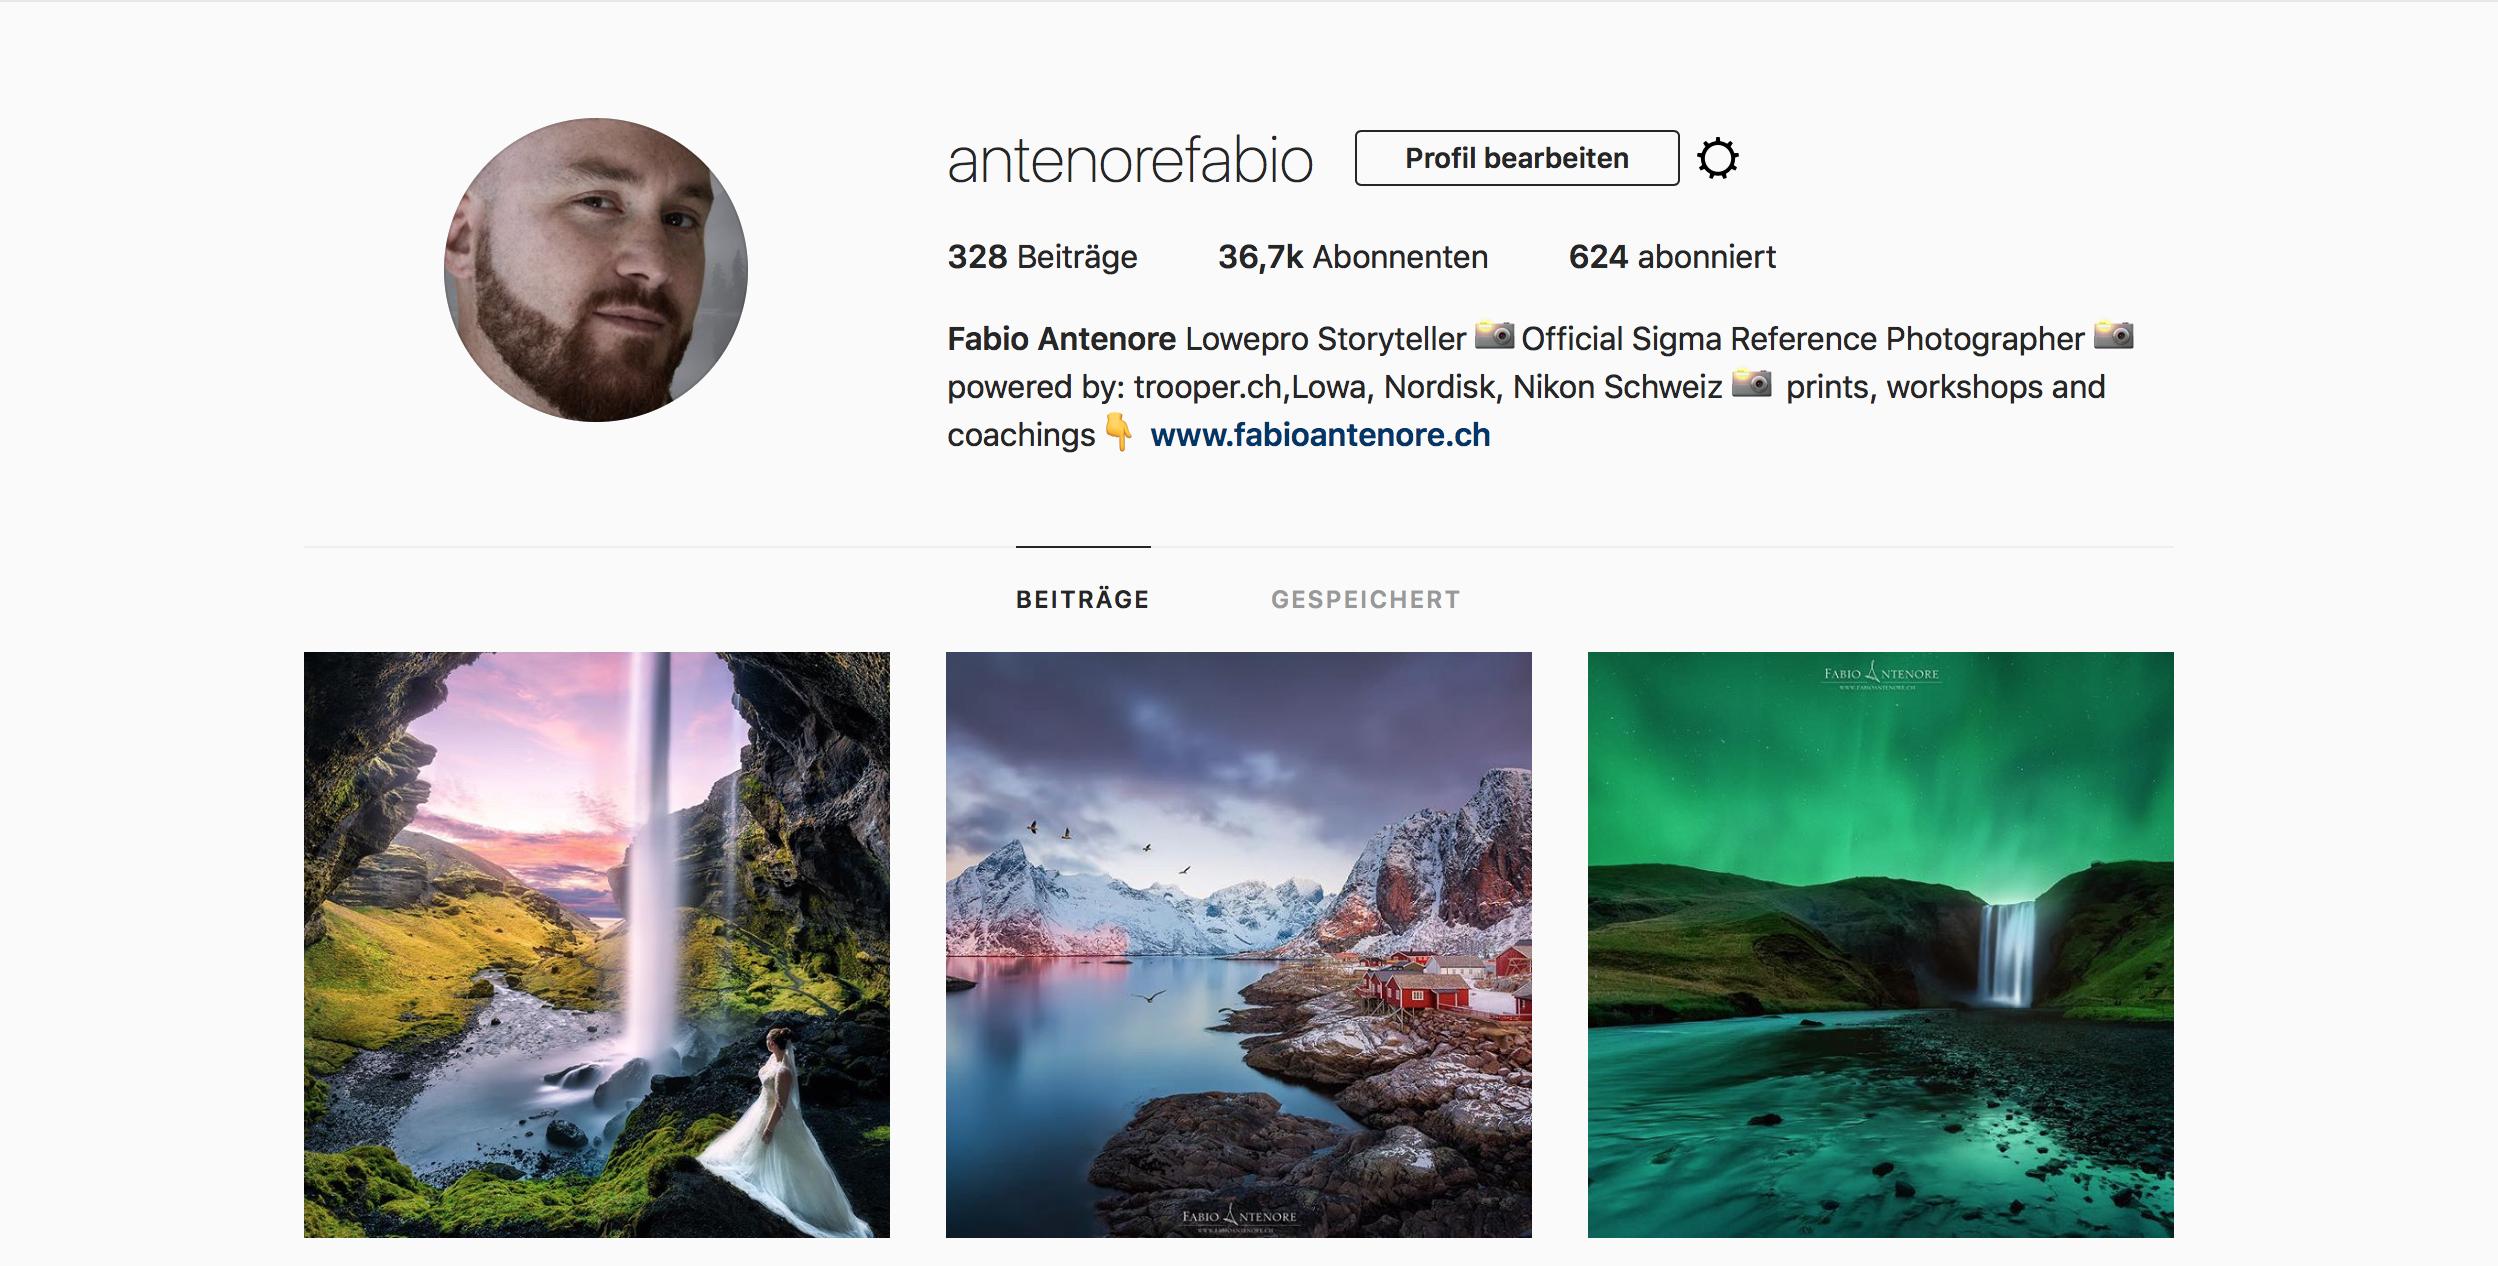 Fabio_Antenore_Instagram_digitalEVENT2018_2.png